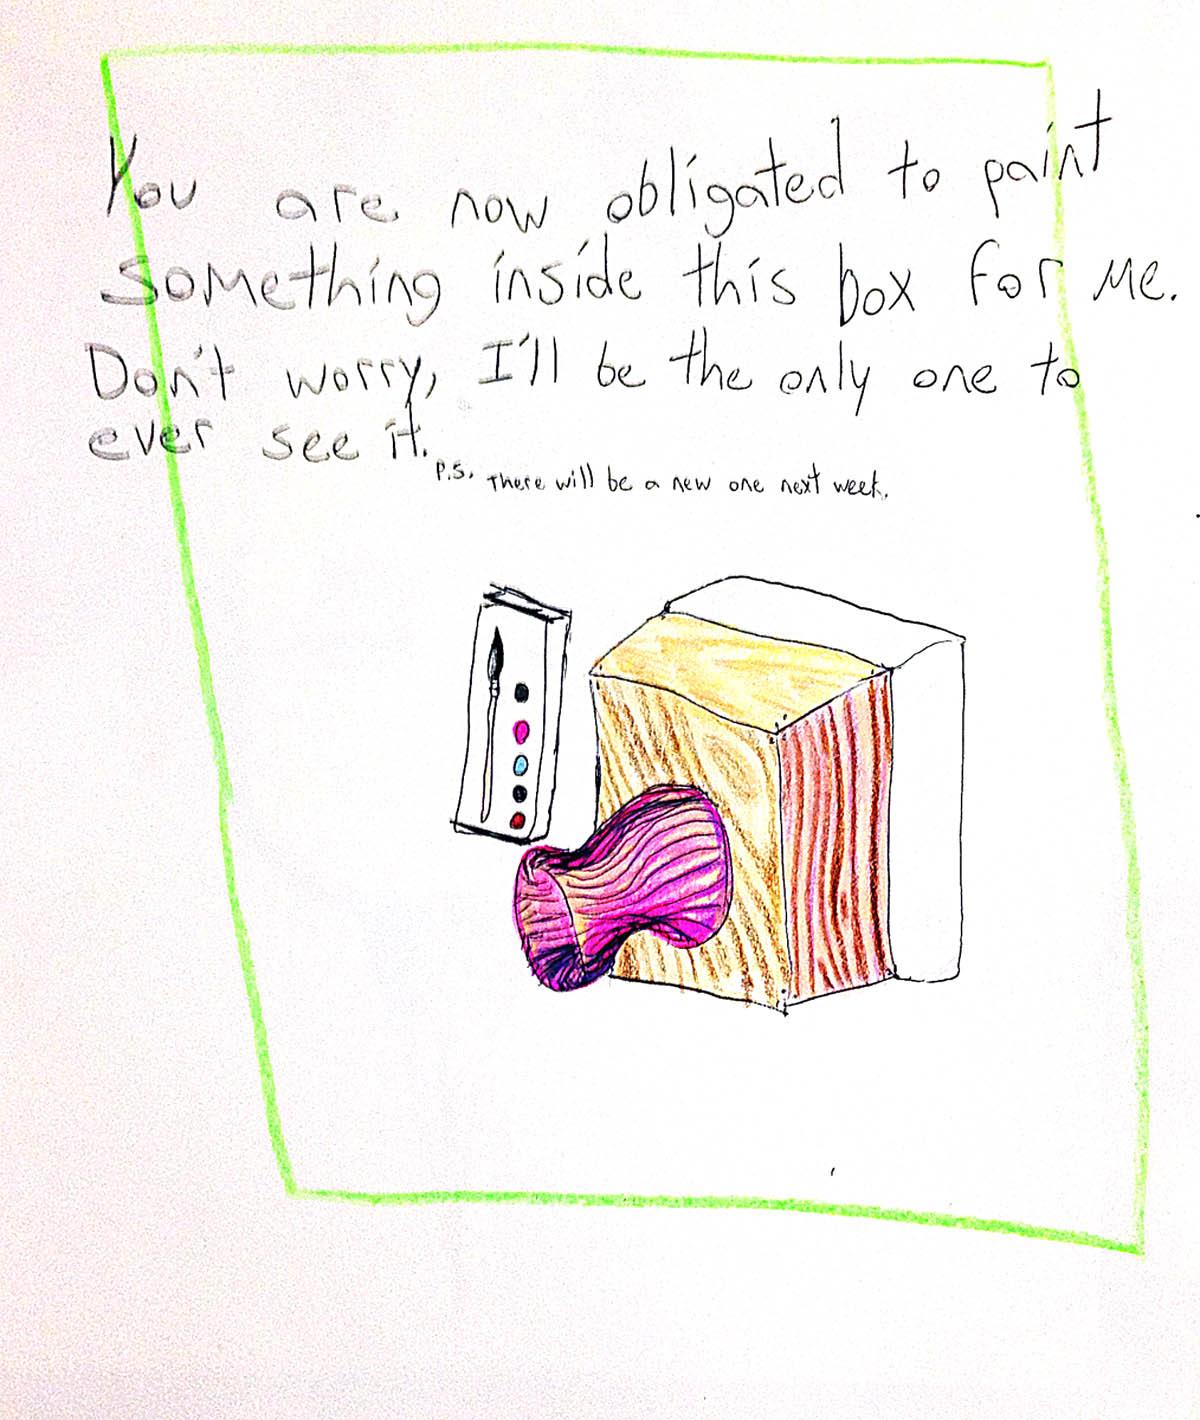 Lance Turner Obligation pencil on paper 10.25 x 13.5 inches LTU 003G.jpg